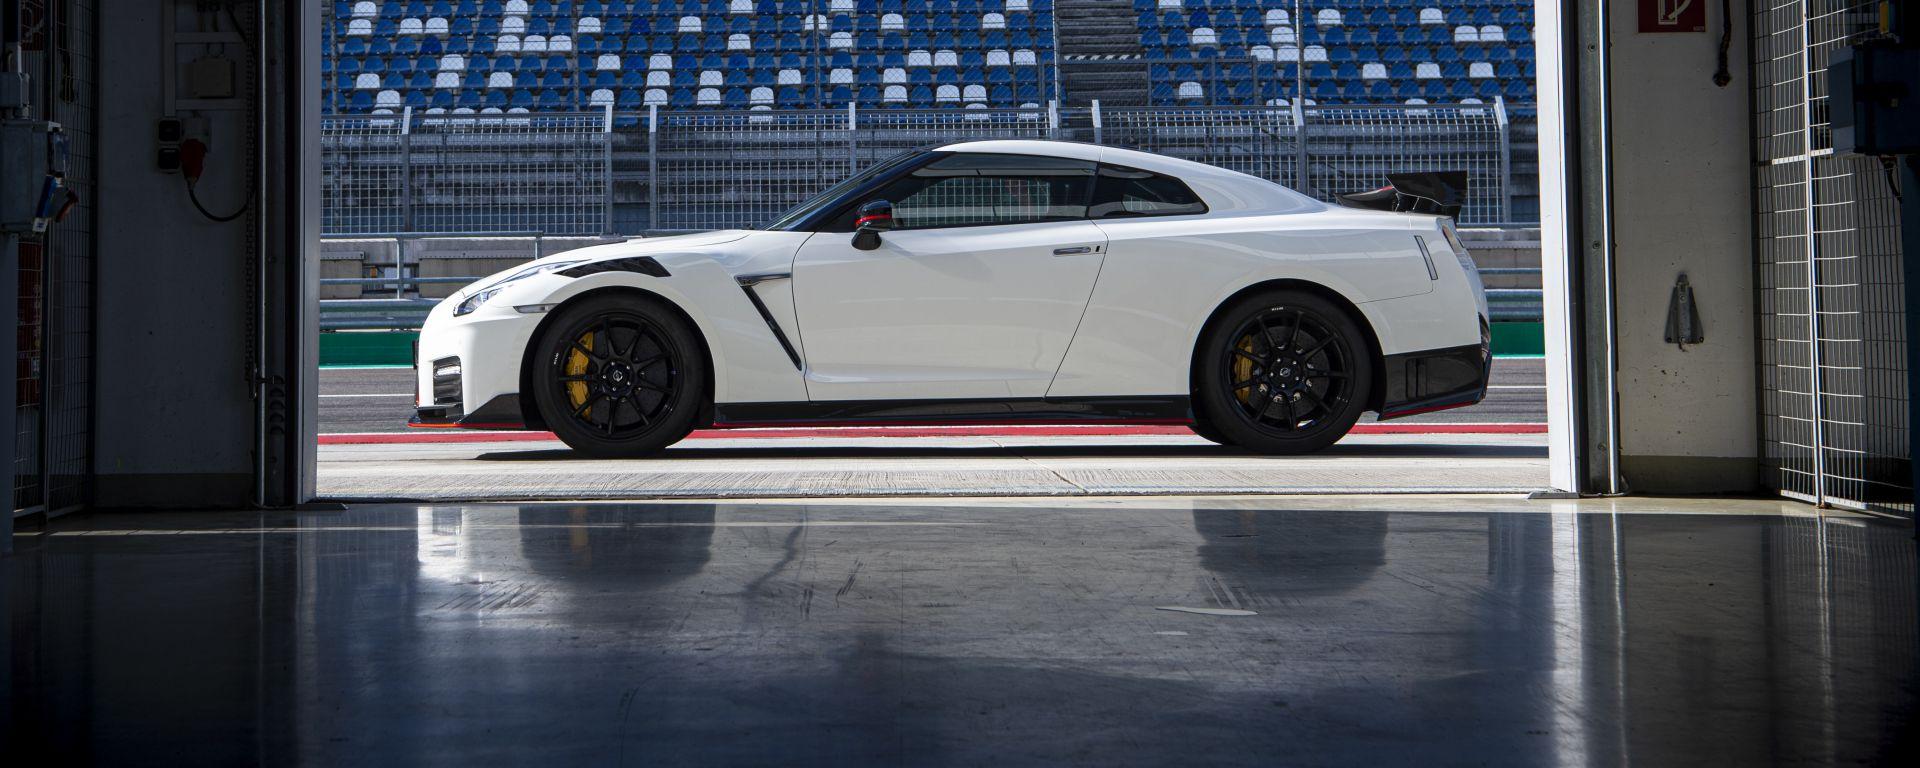 Nissan GT-R Nismo 2020, vista laterale